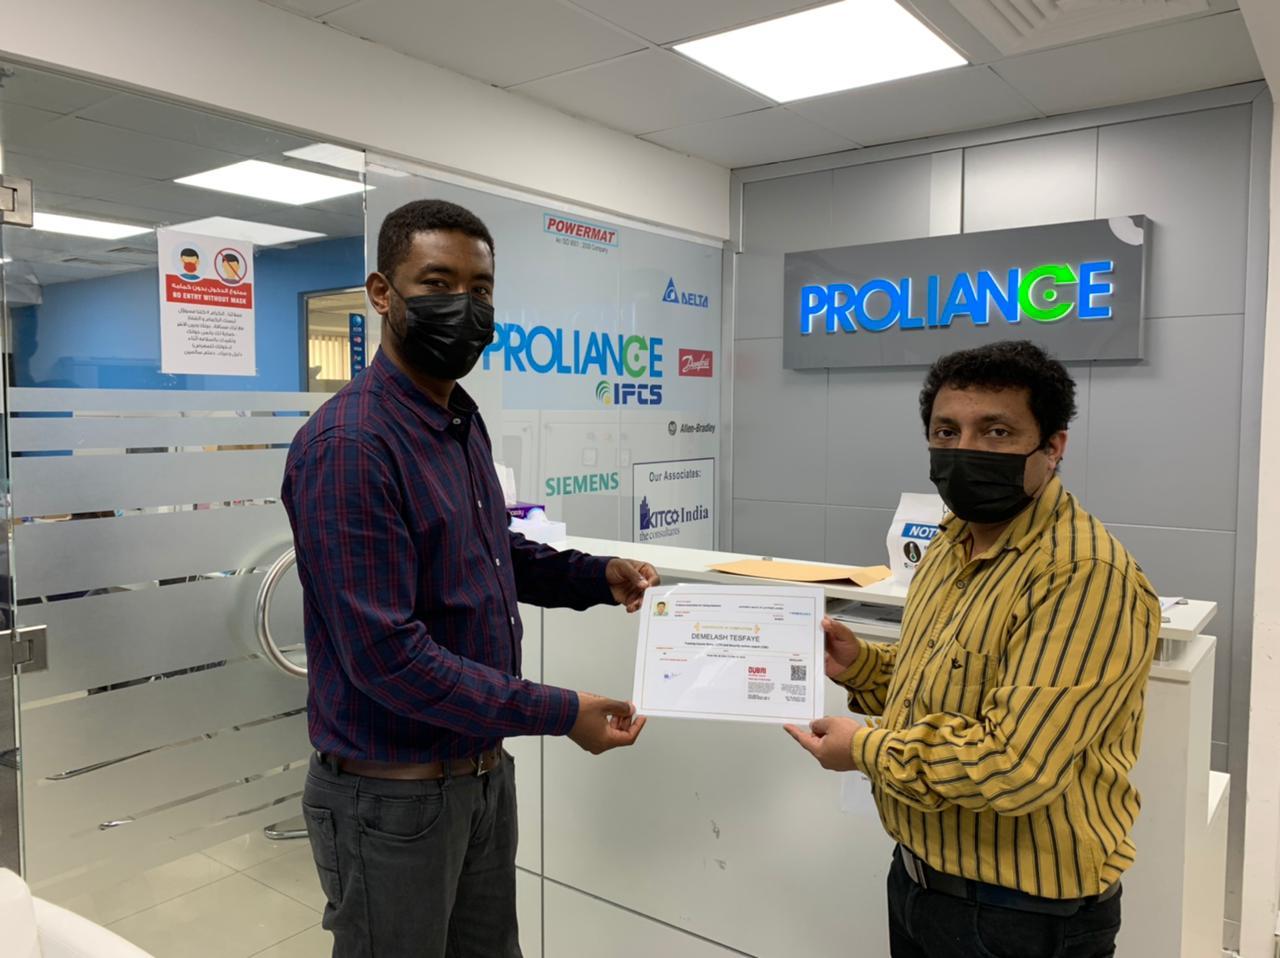 Demelash cctv - Proliance Automation & Training Solutions (IPCS-Dubai)